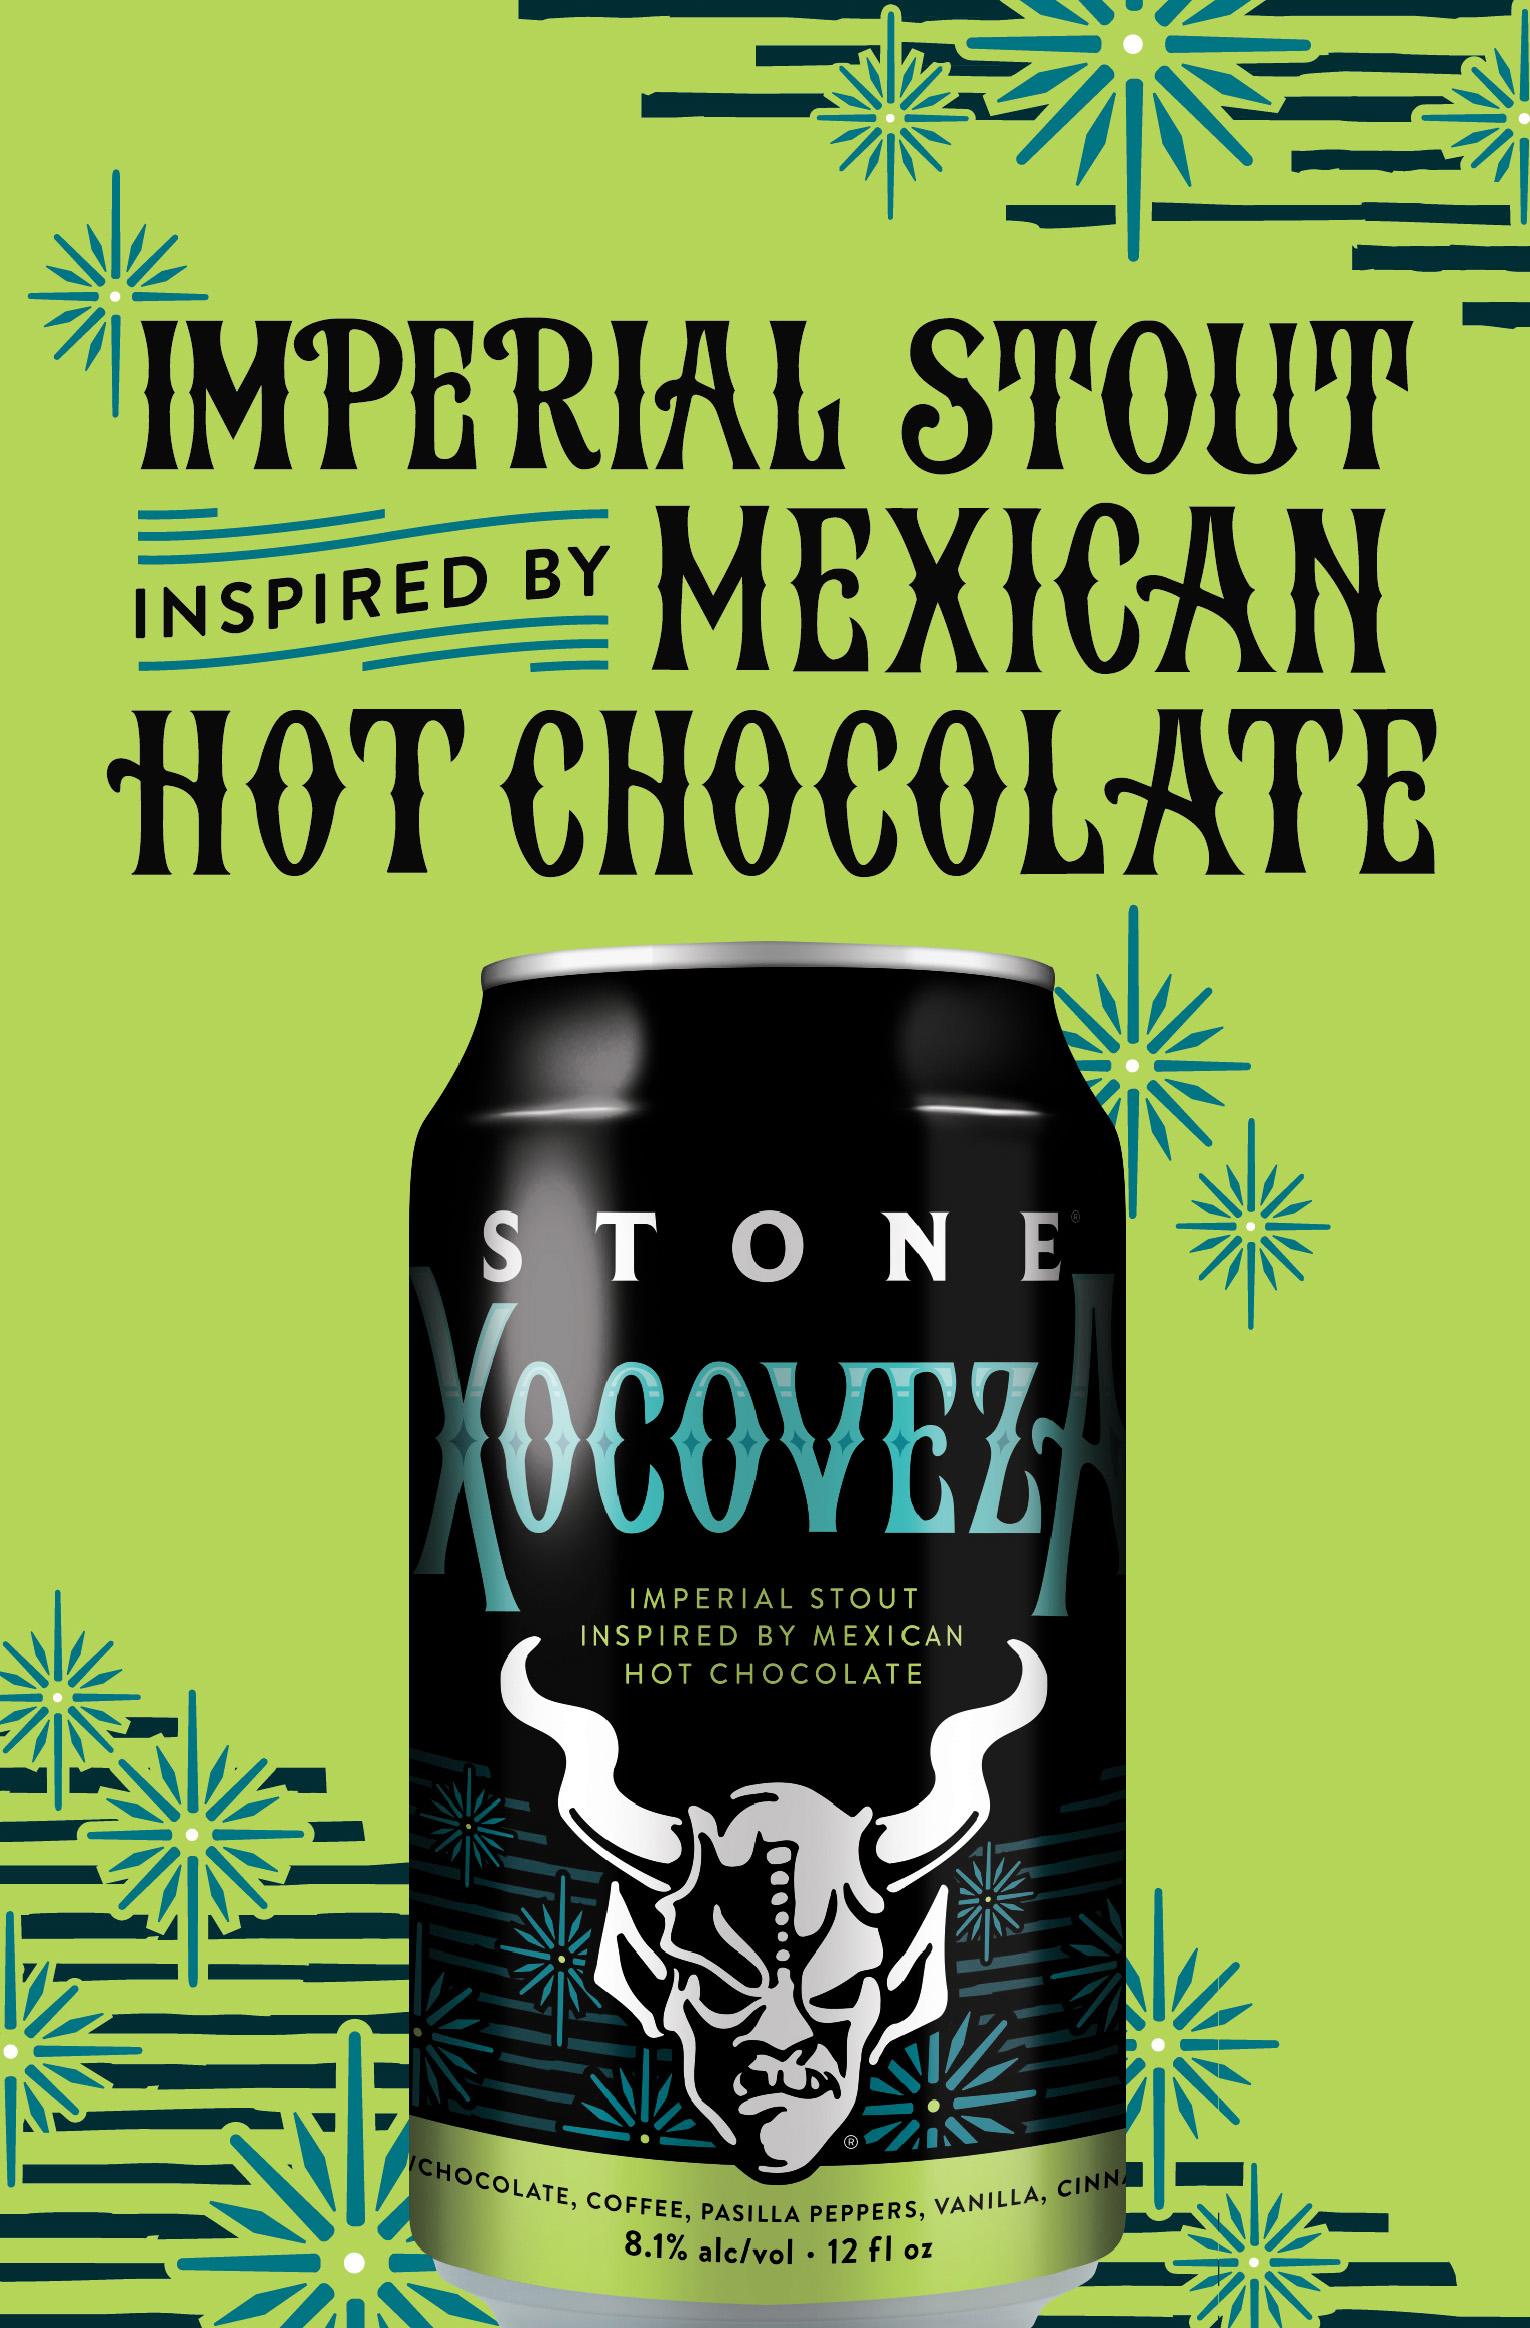 Stone Xocoveza 6pk